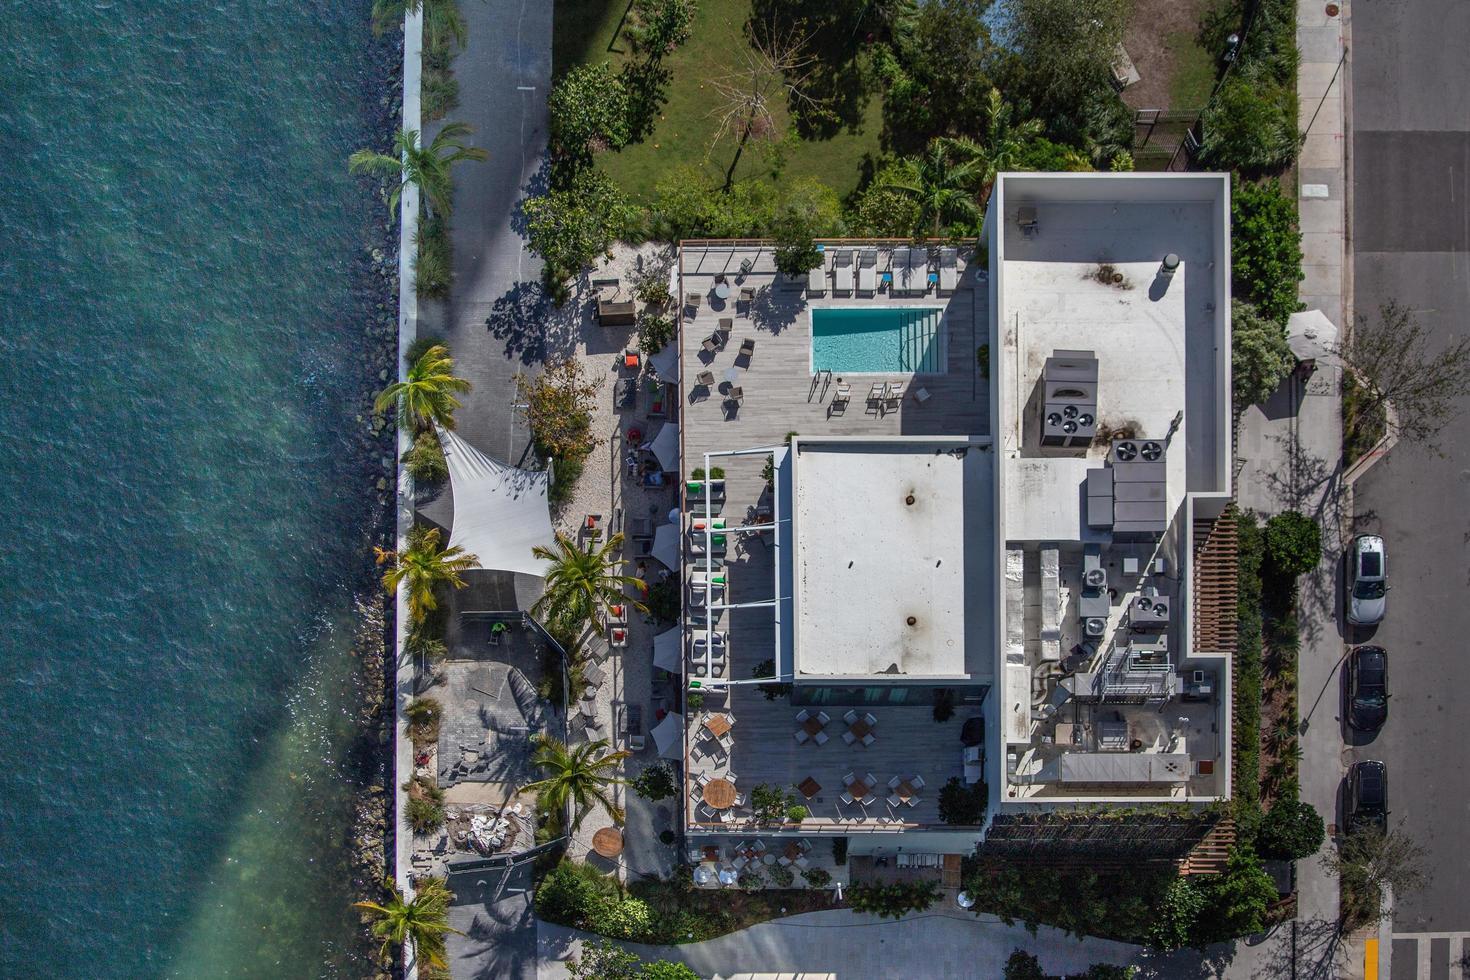 Miami, Florida, 2020 - Aerial view of home near ocean photo